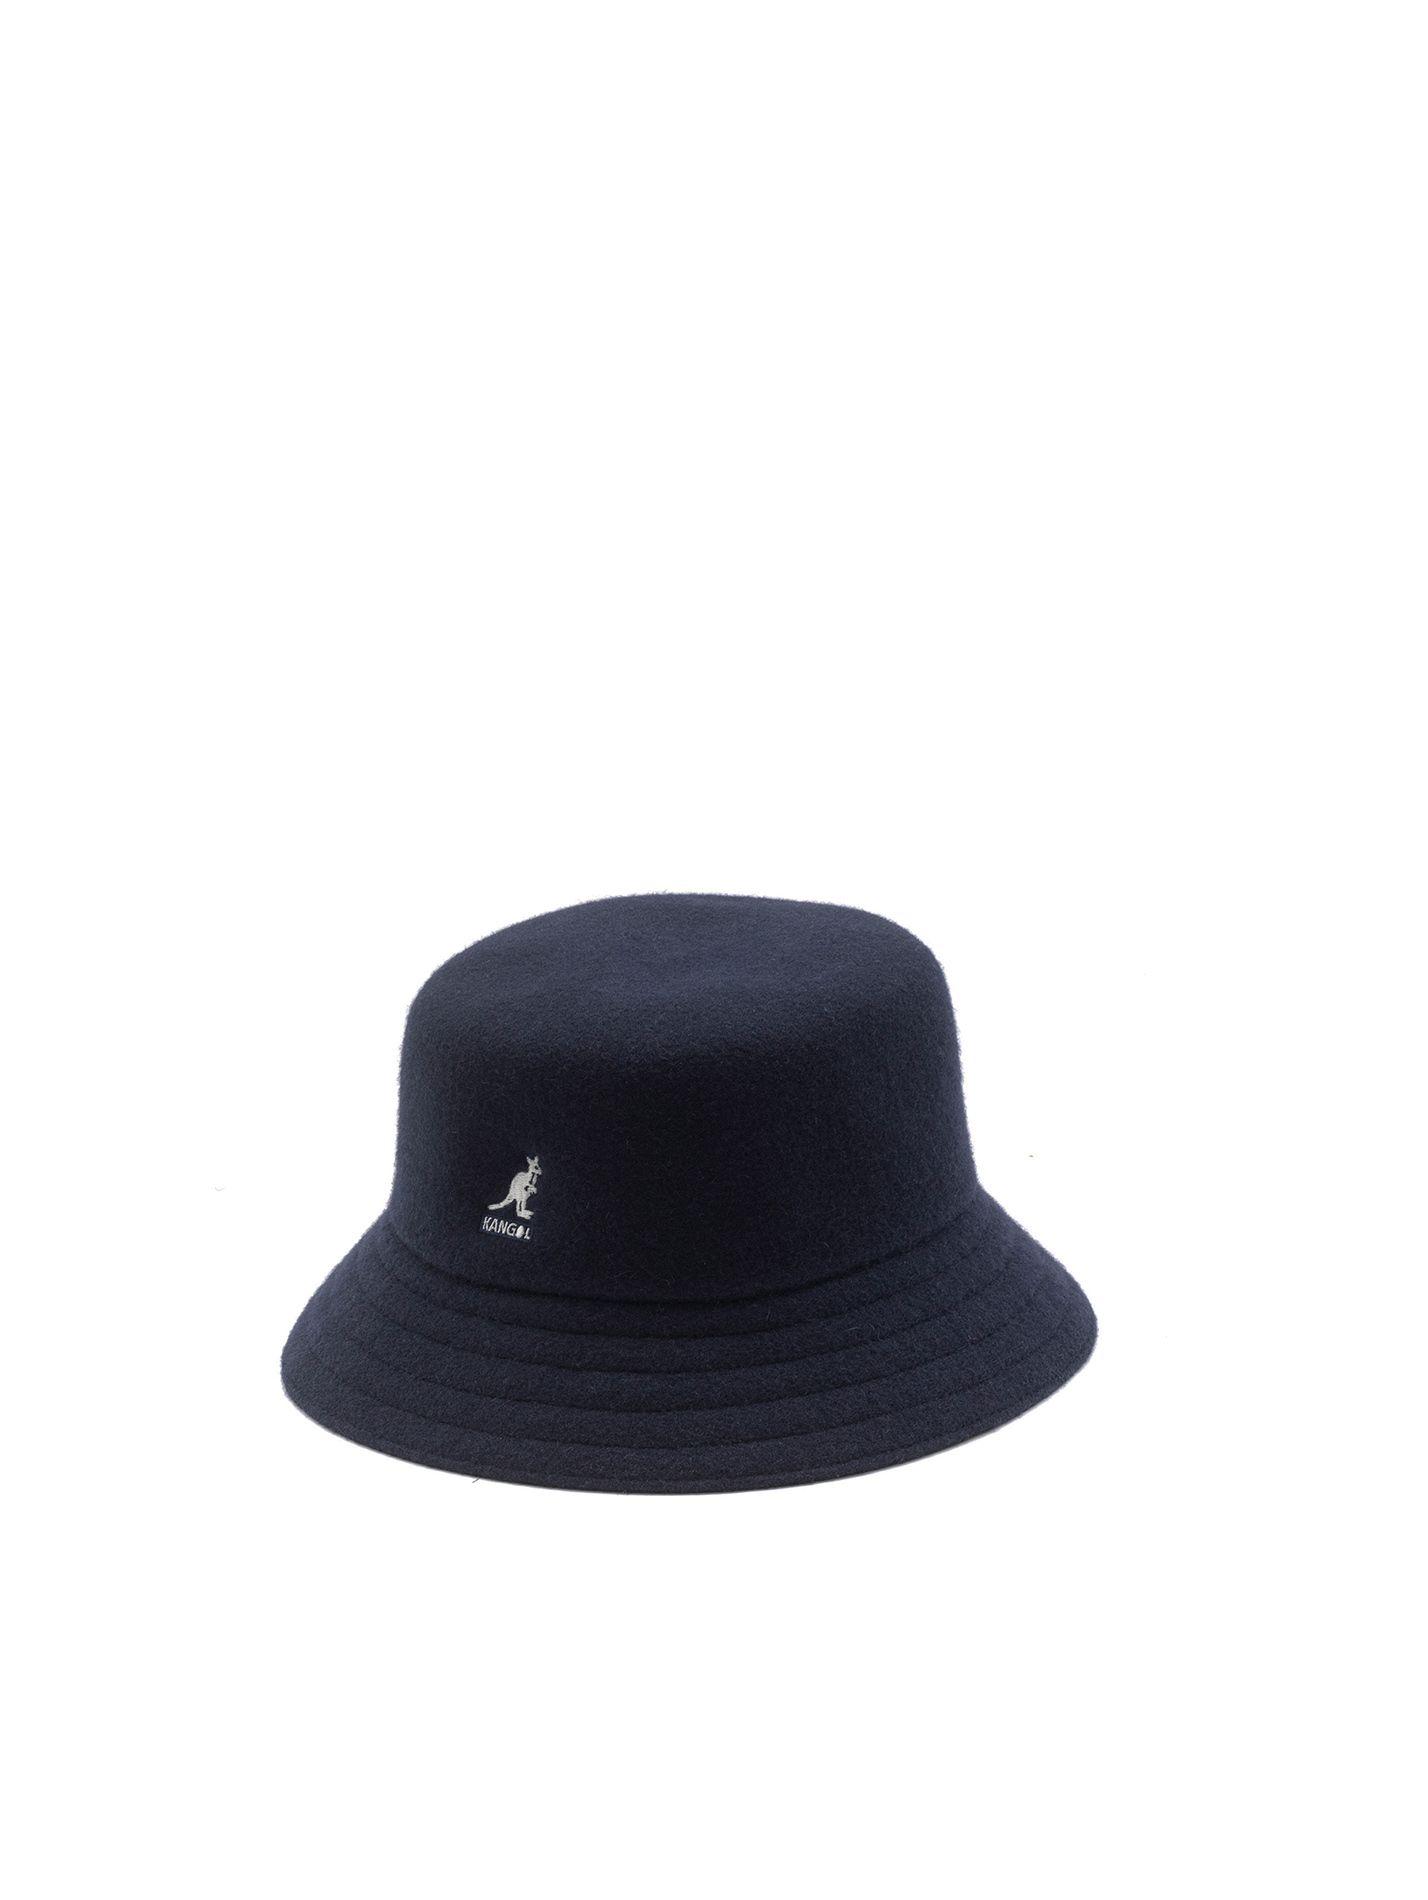 Wool Lanich Navy